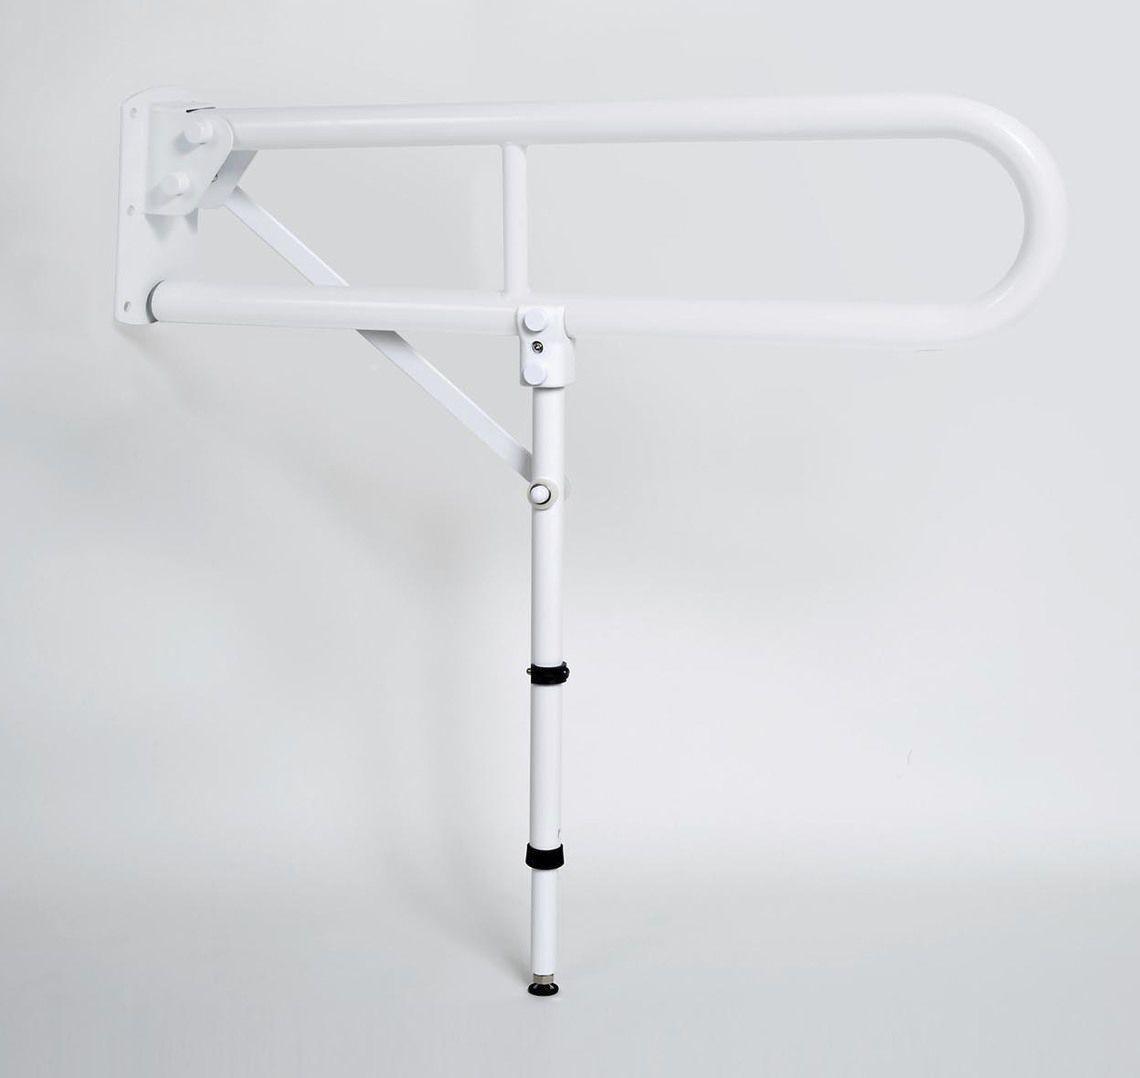 Toilet grab bar / wall-mounted / folding - GRH001, GRH002 - Drive ...